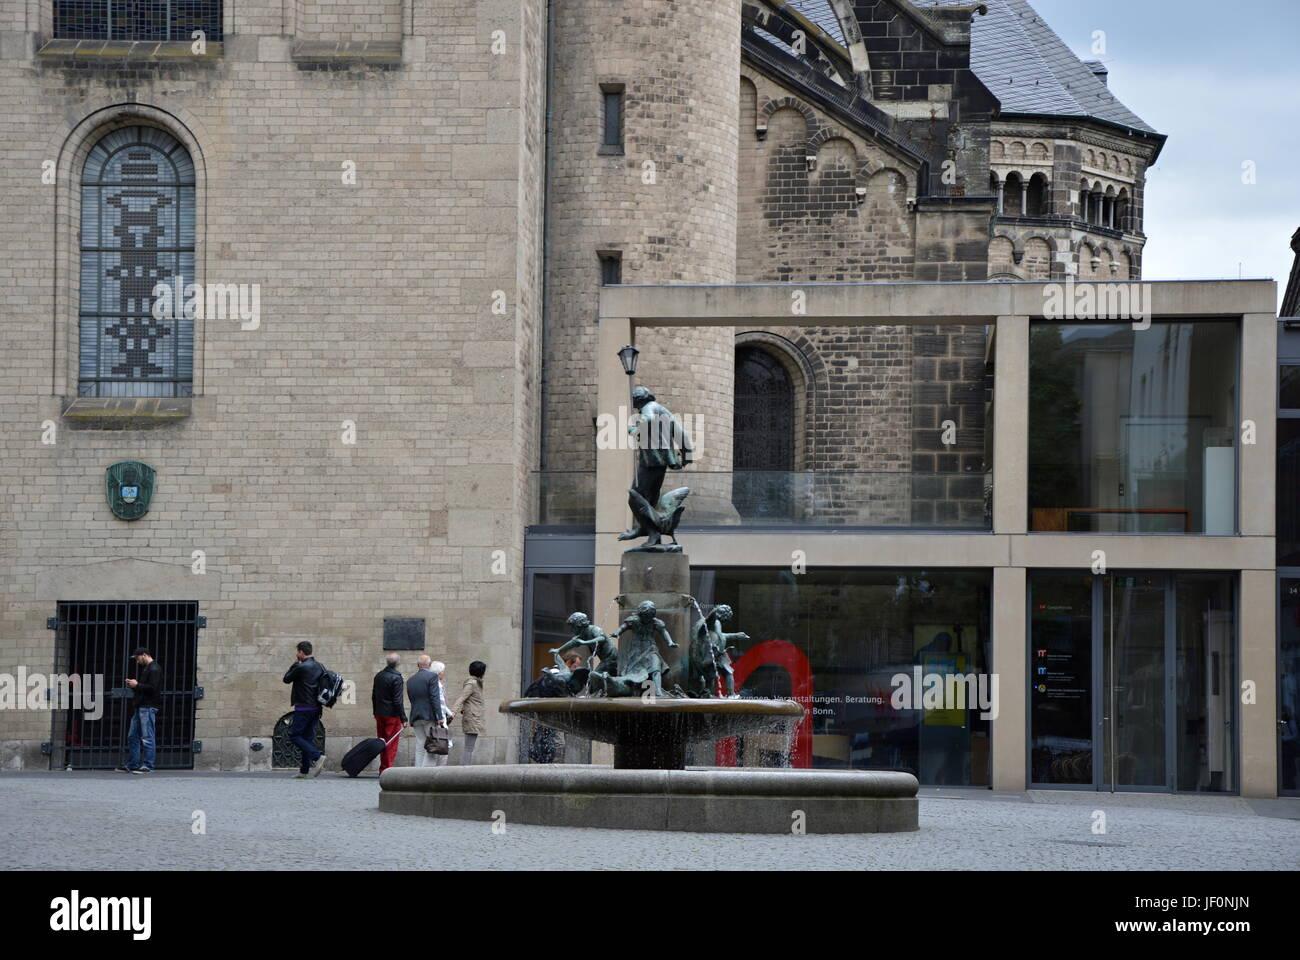 Bonn, Nordrhein - Westfalen, Germany Stock Photo